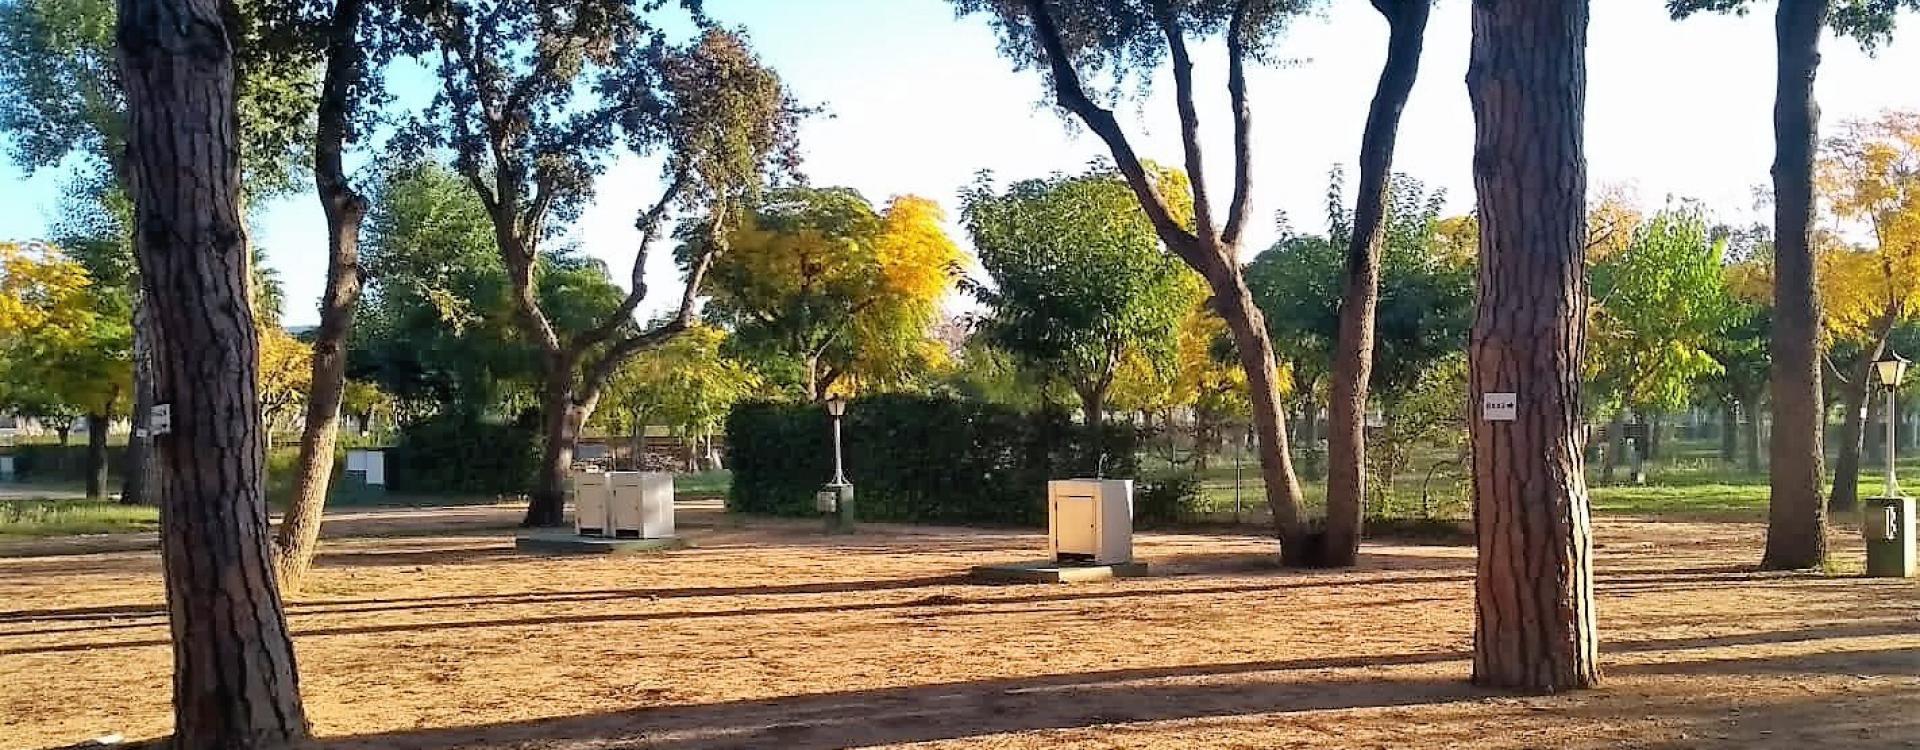 Camping Valldaro nova zona amb aigua